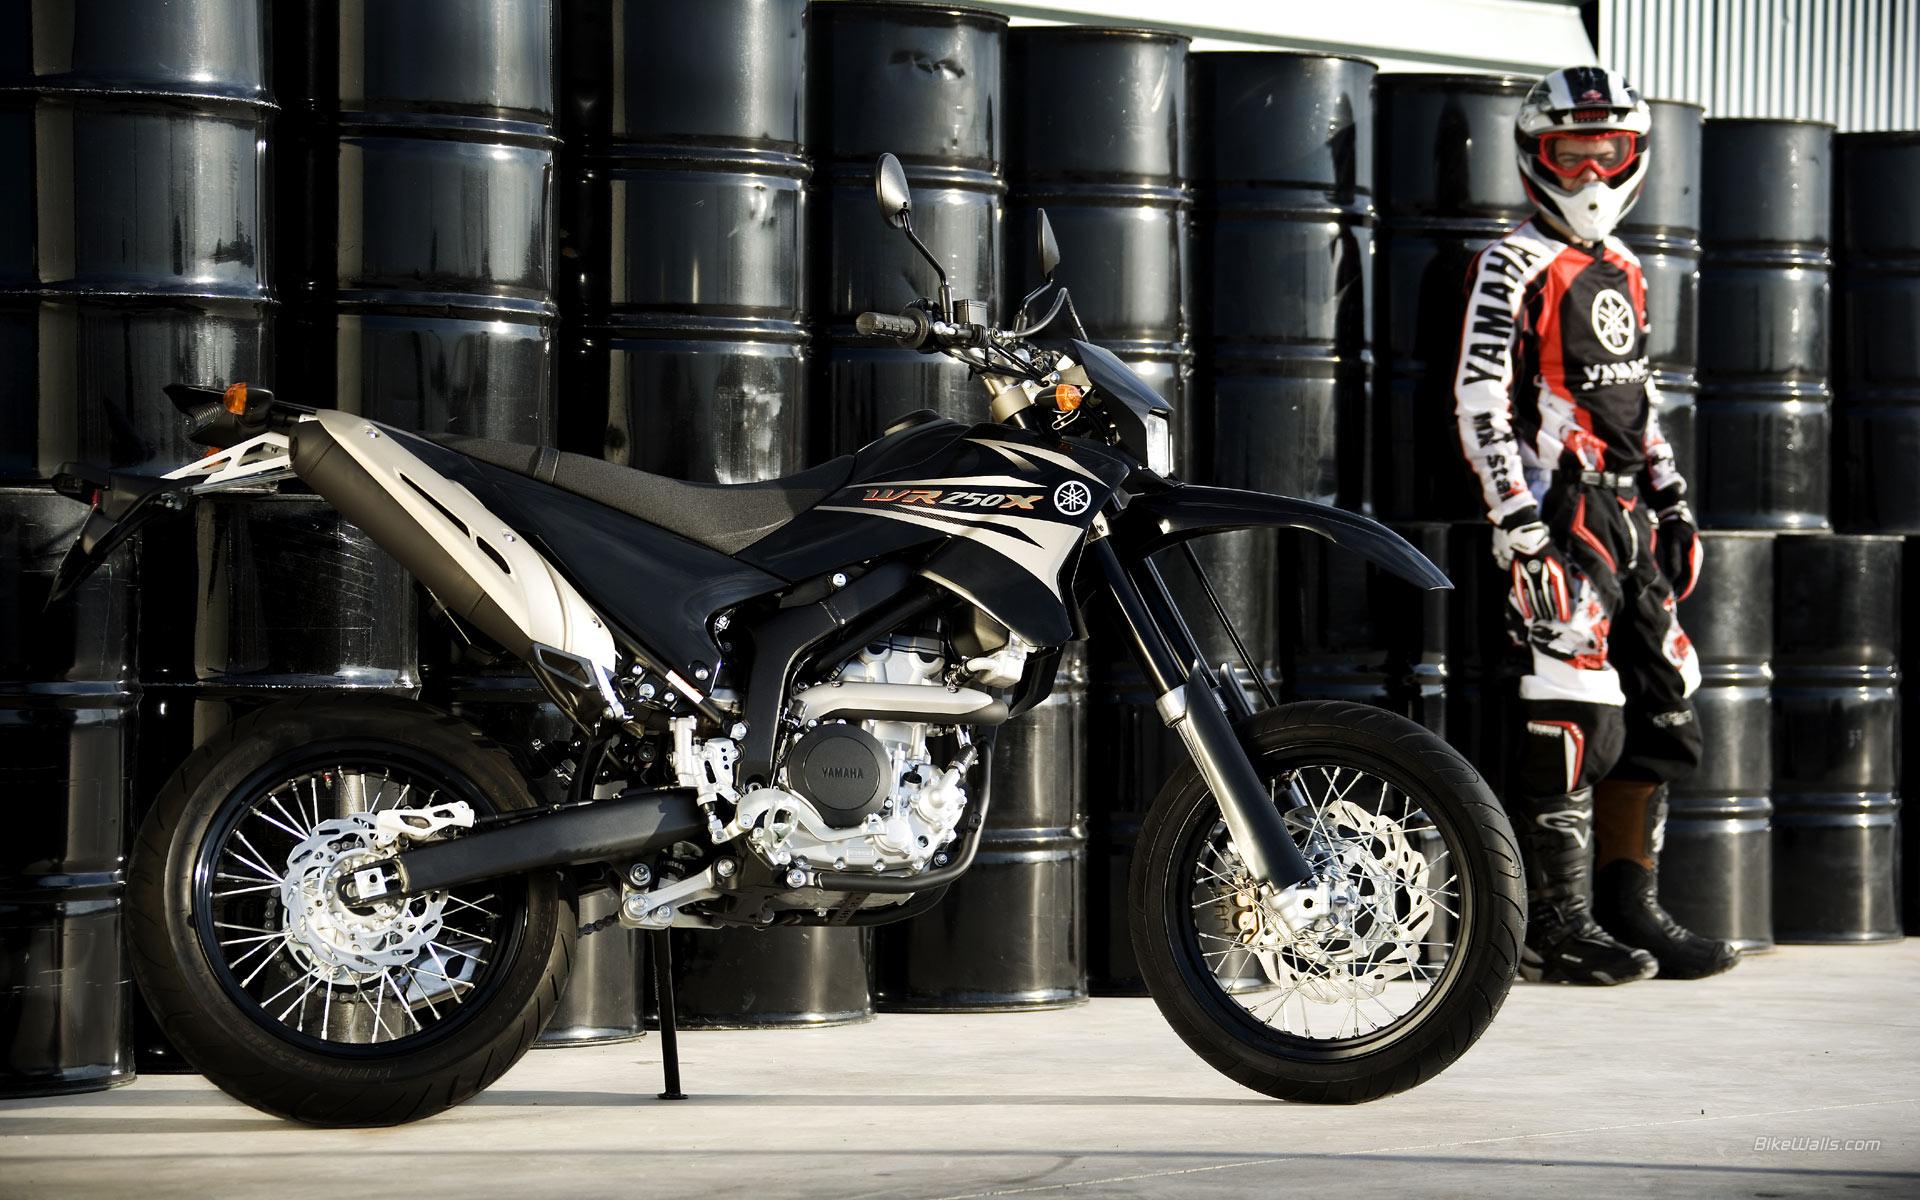 Yamaha WR250X 1920 x 1200 wallpaper 1920x1200